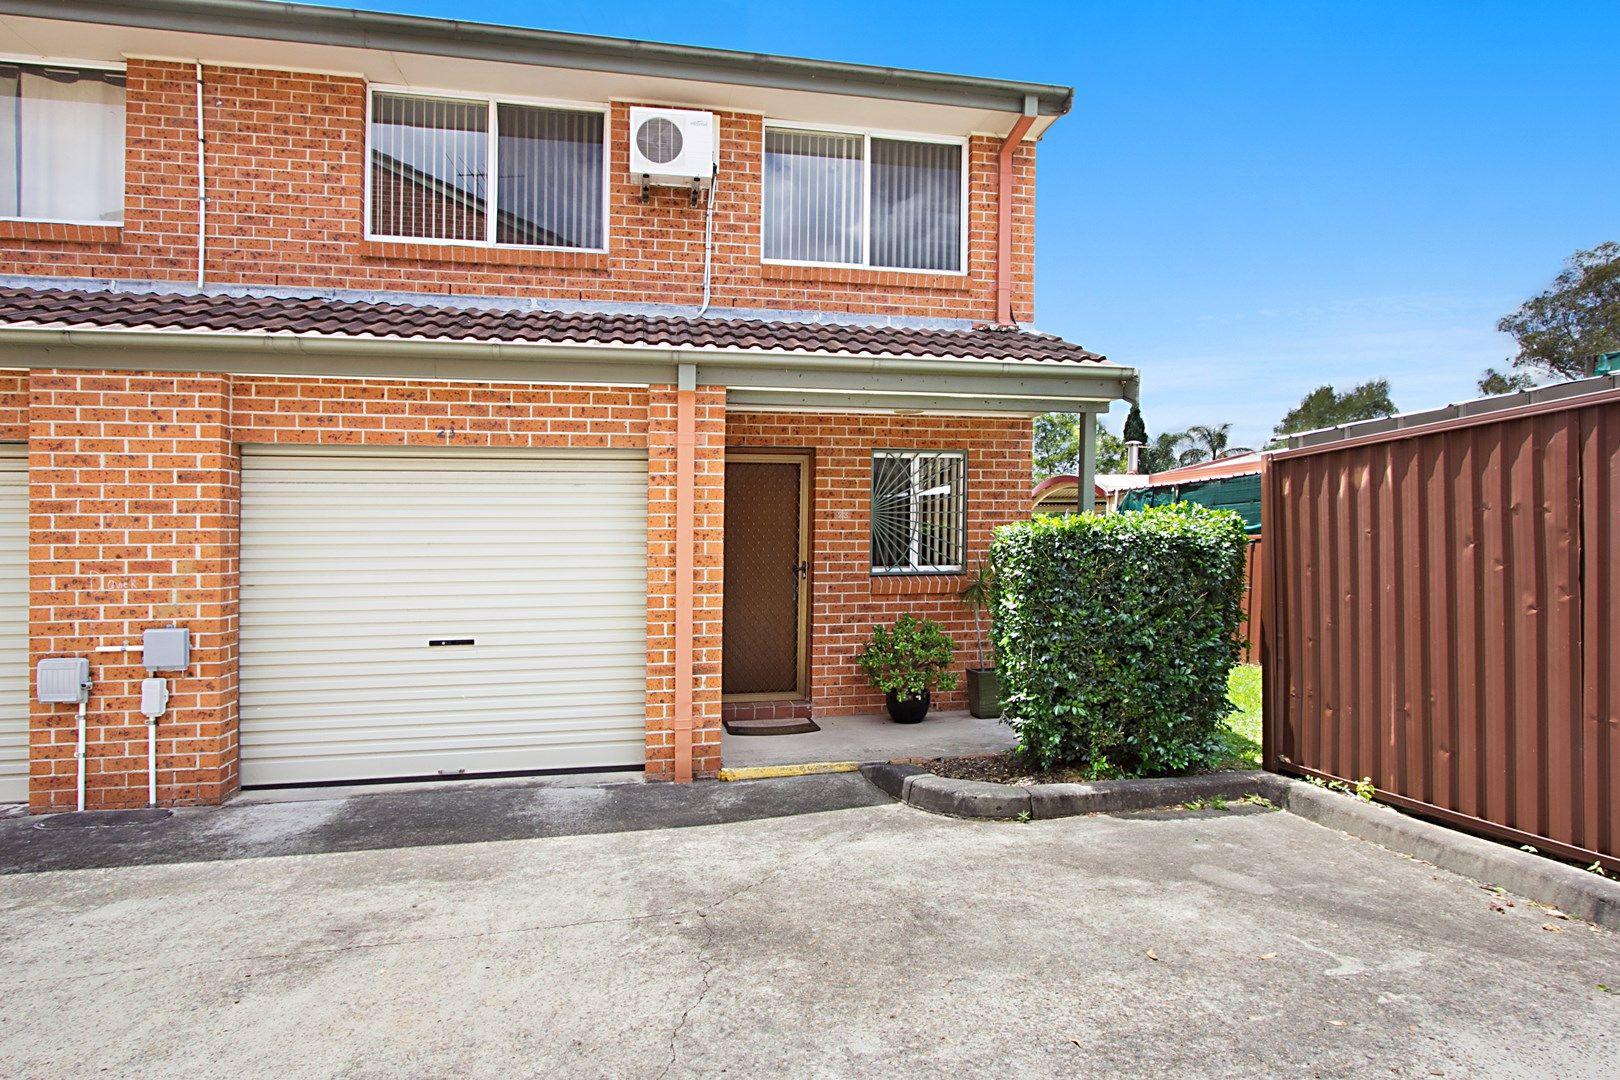 23/16 Patricia Street, Blacktown NSW 2148, Image 0